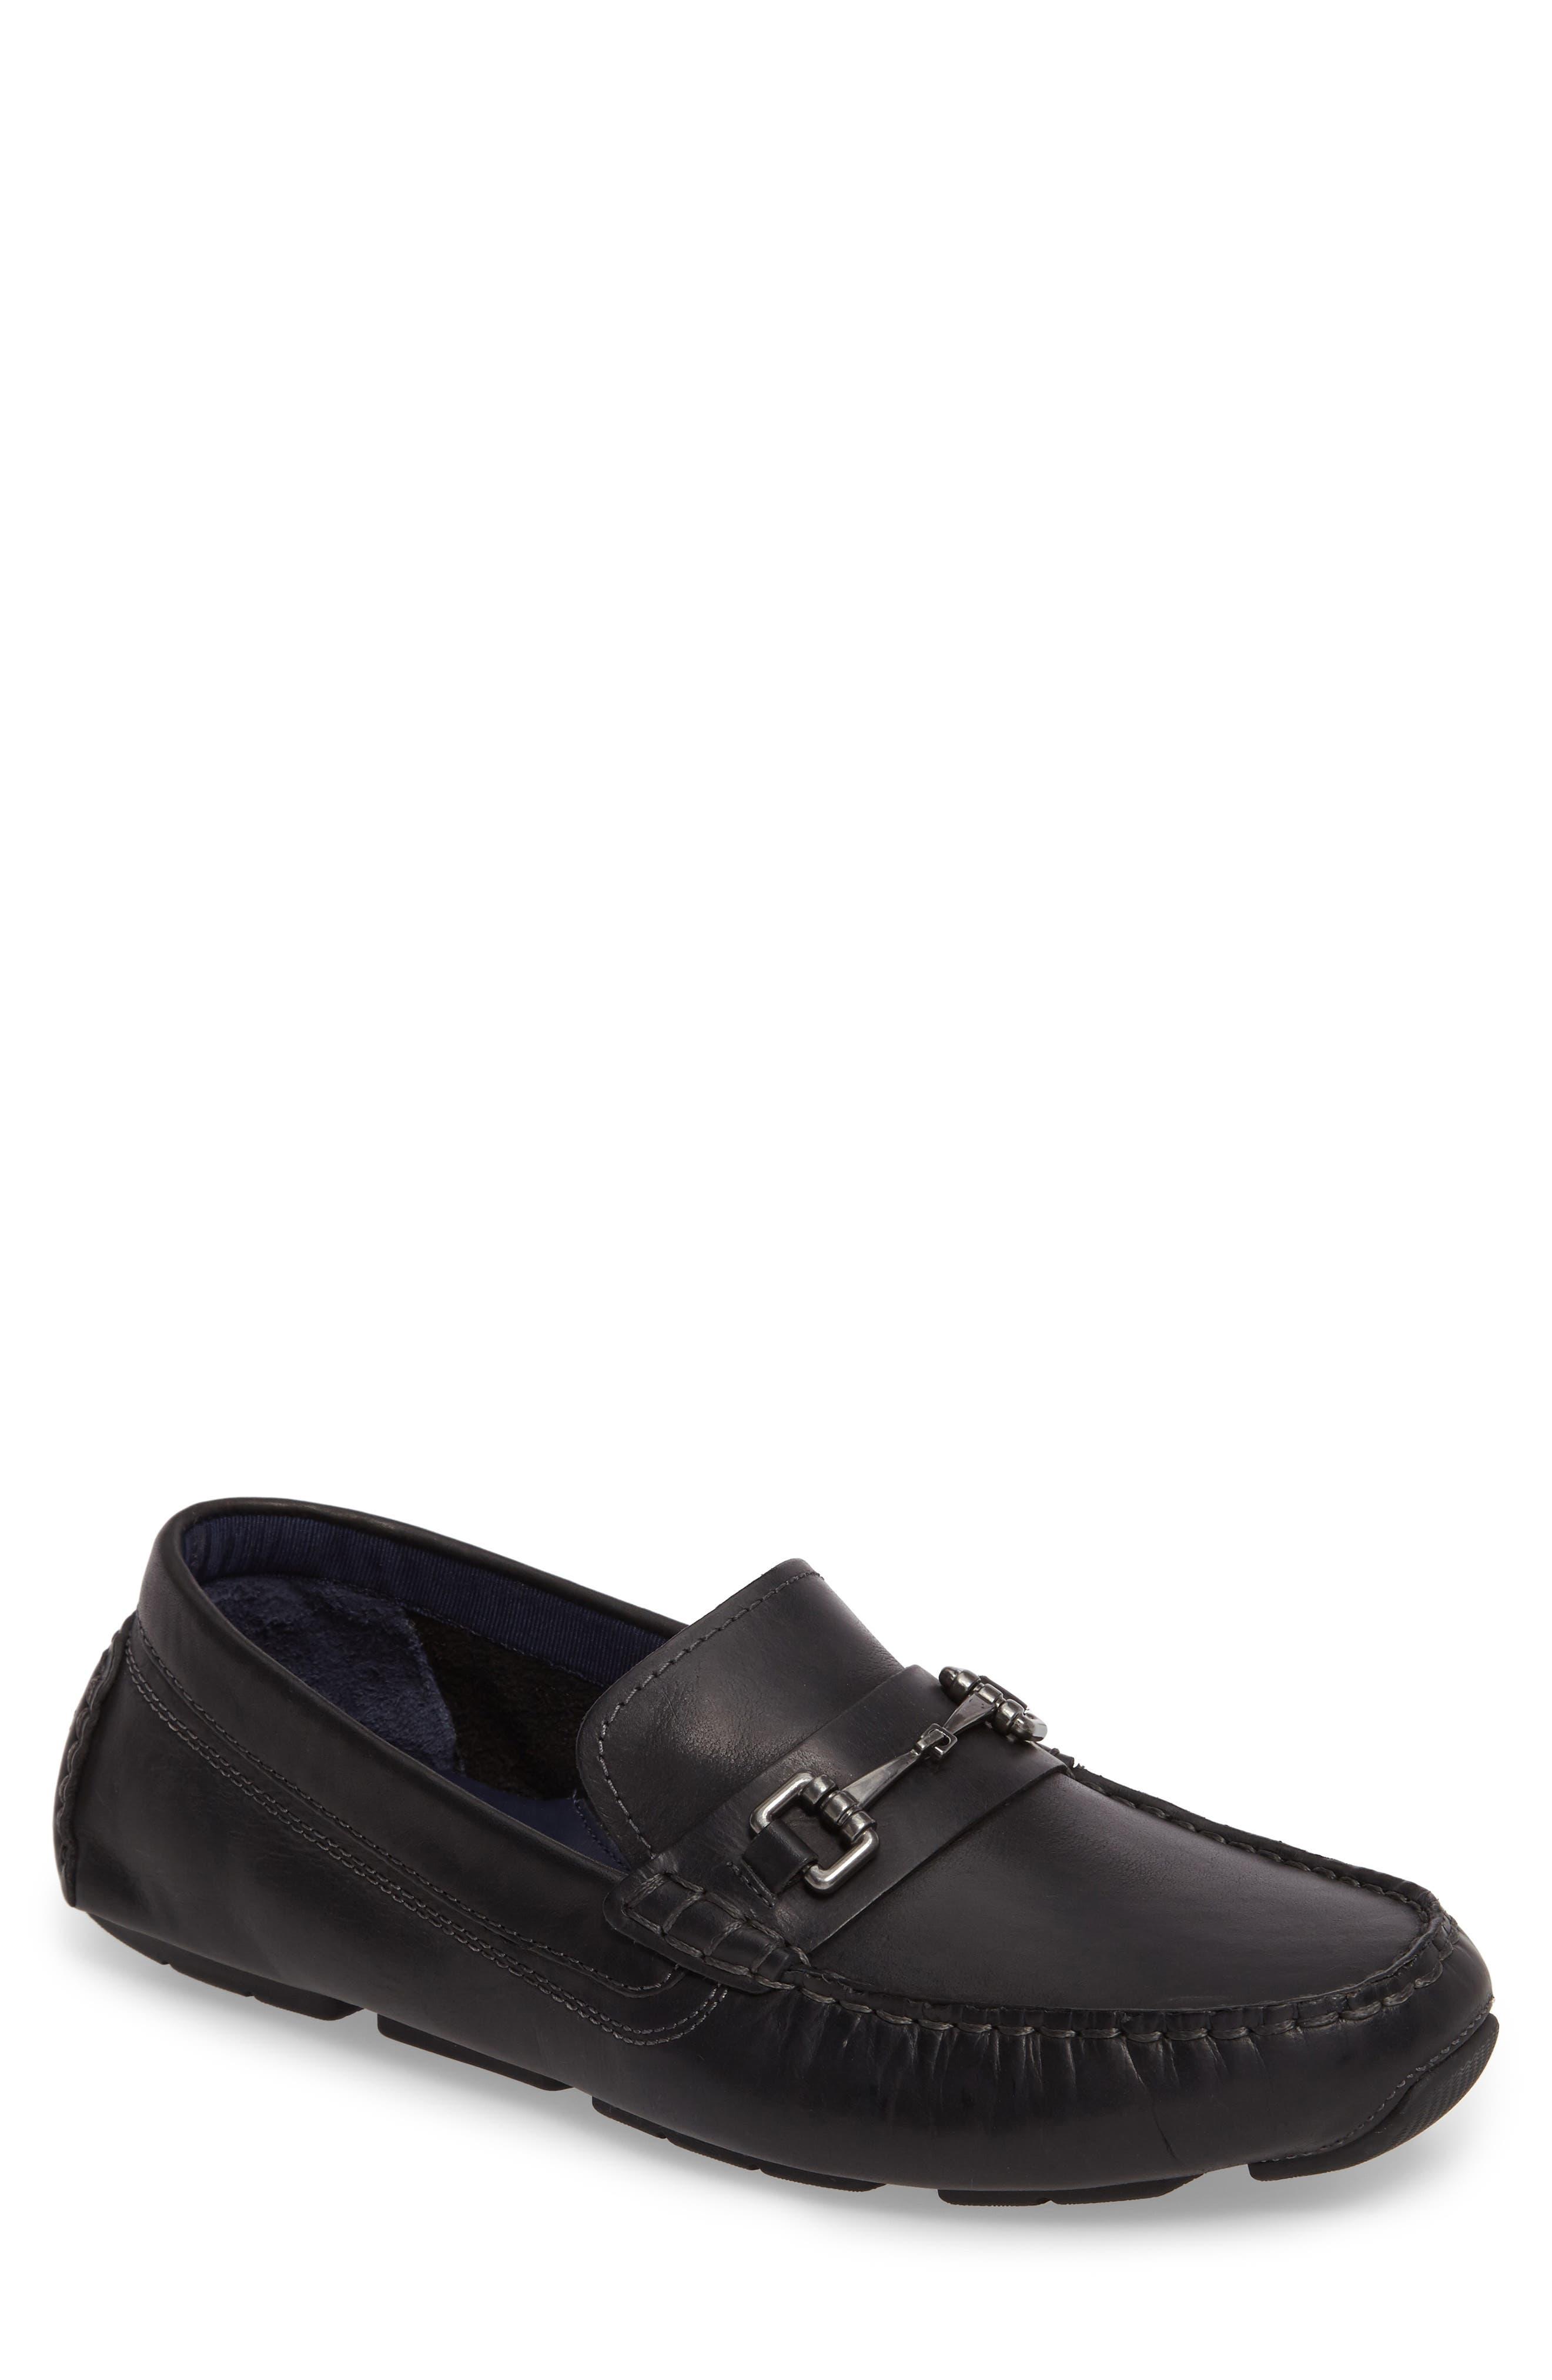 Kelson Bit Driving Shoe,                             Main thumbnail 1, color,                             Black Leather